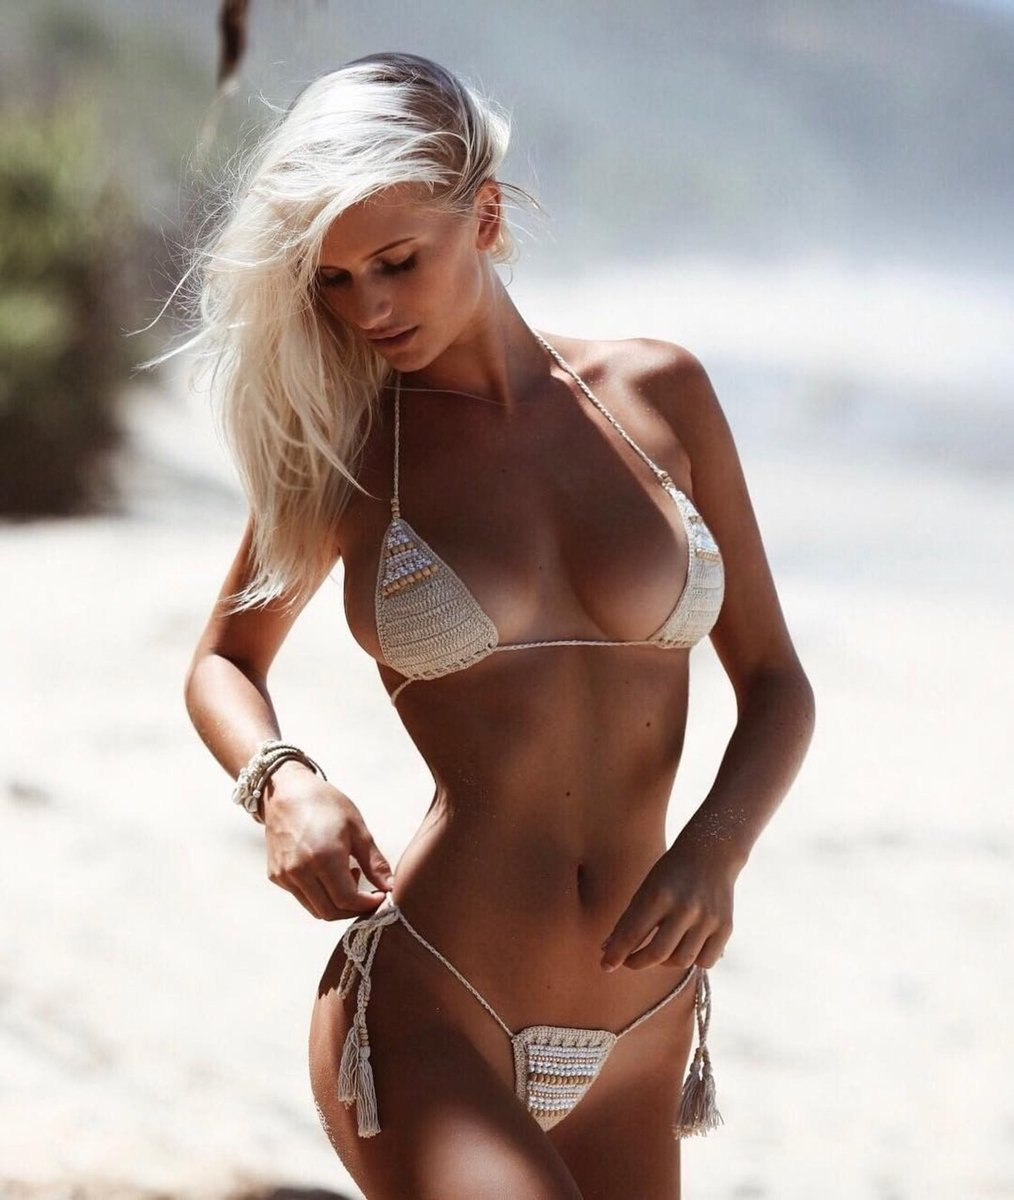 Lace Sexy Women Bra Push Up Adjustable Without Rim Soft Daily Fashion Female Bras